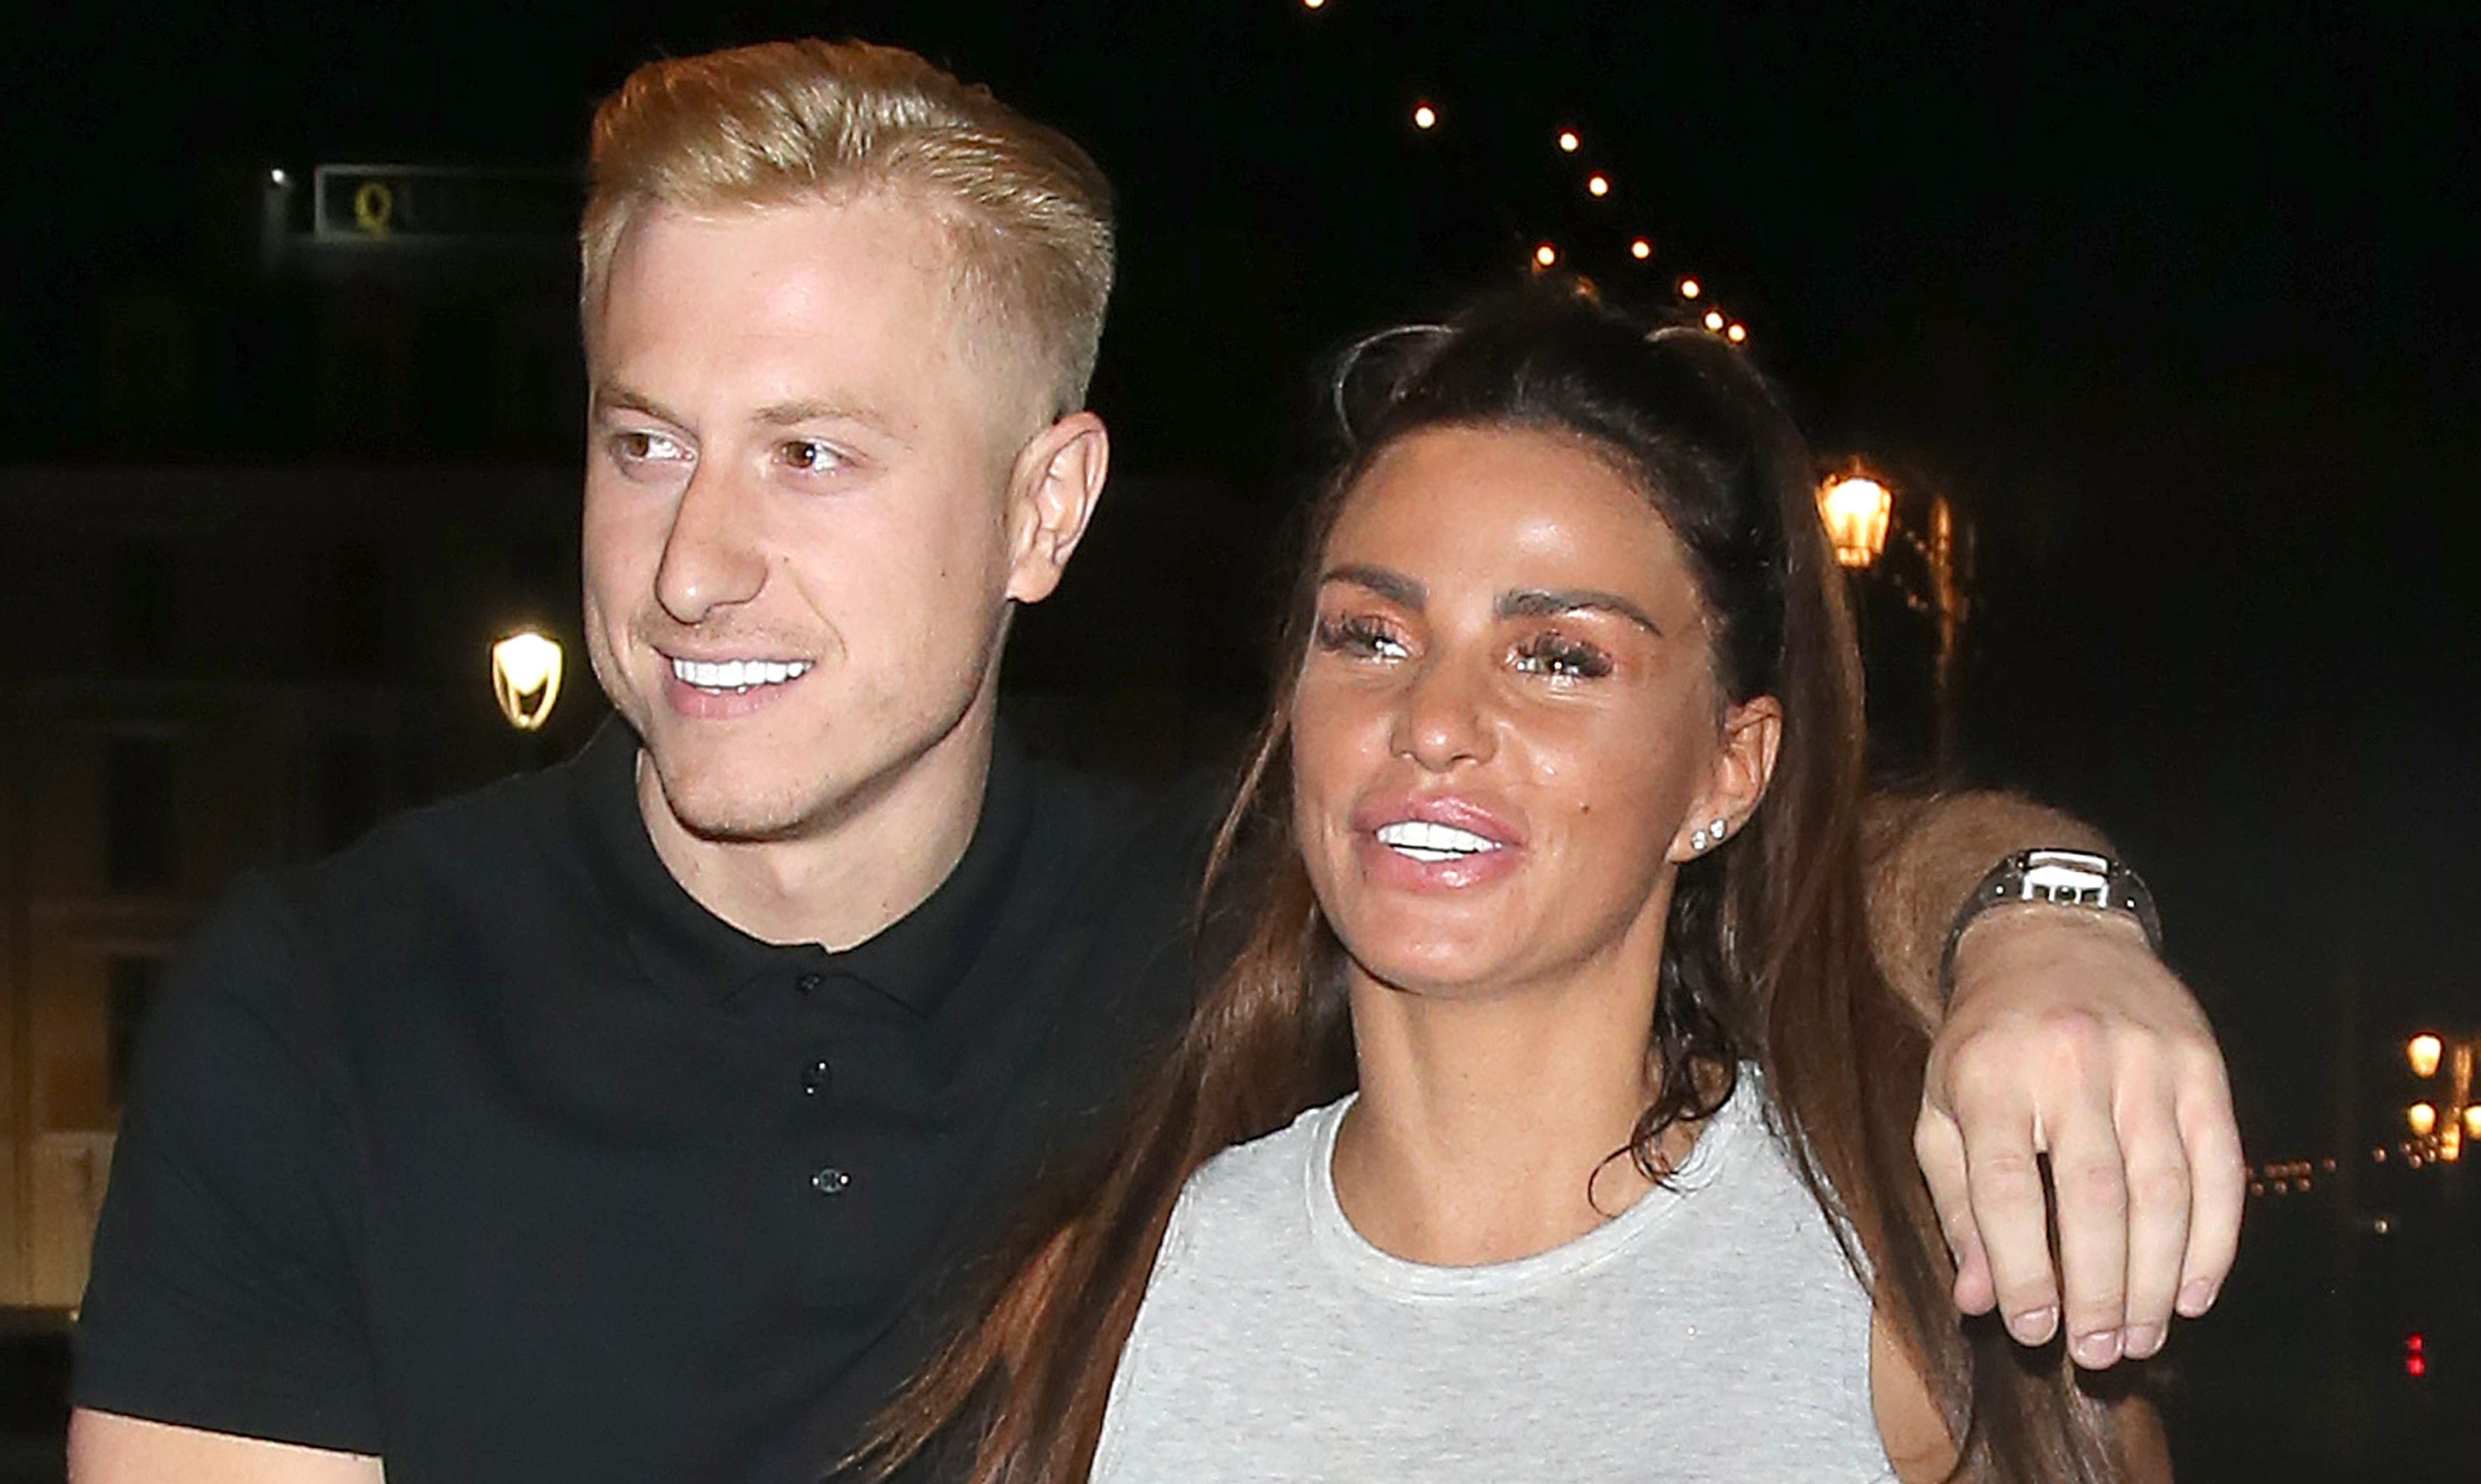 Happy Couple Katie Price And Kris Boyson Leave Shooshh Club In London